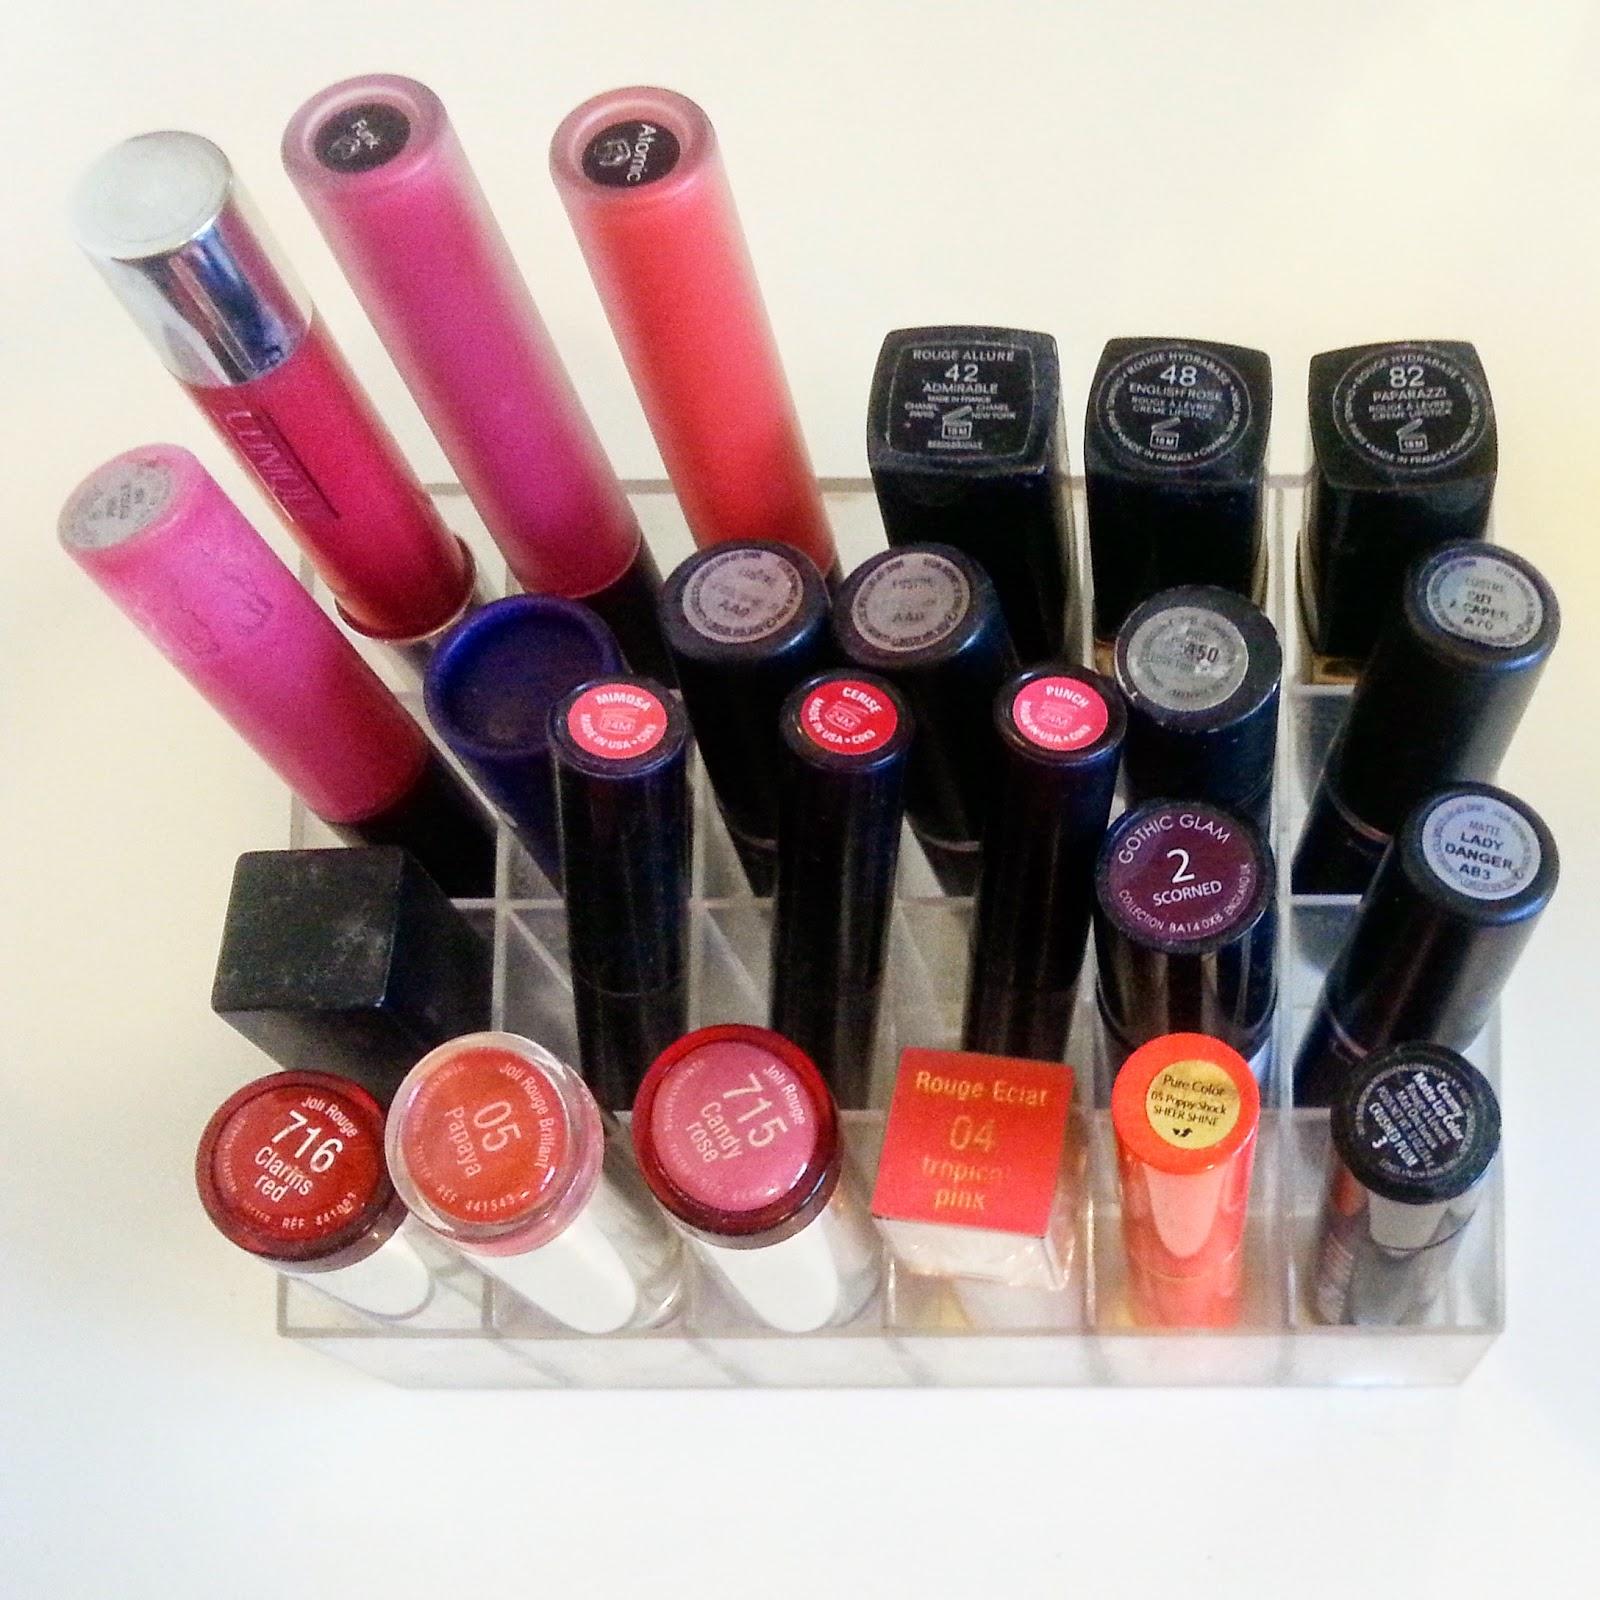 Makeup storage lipstick storage